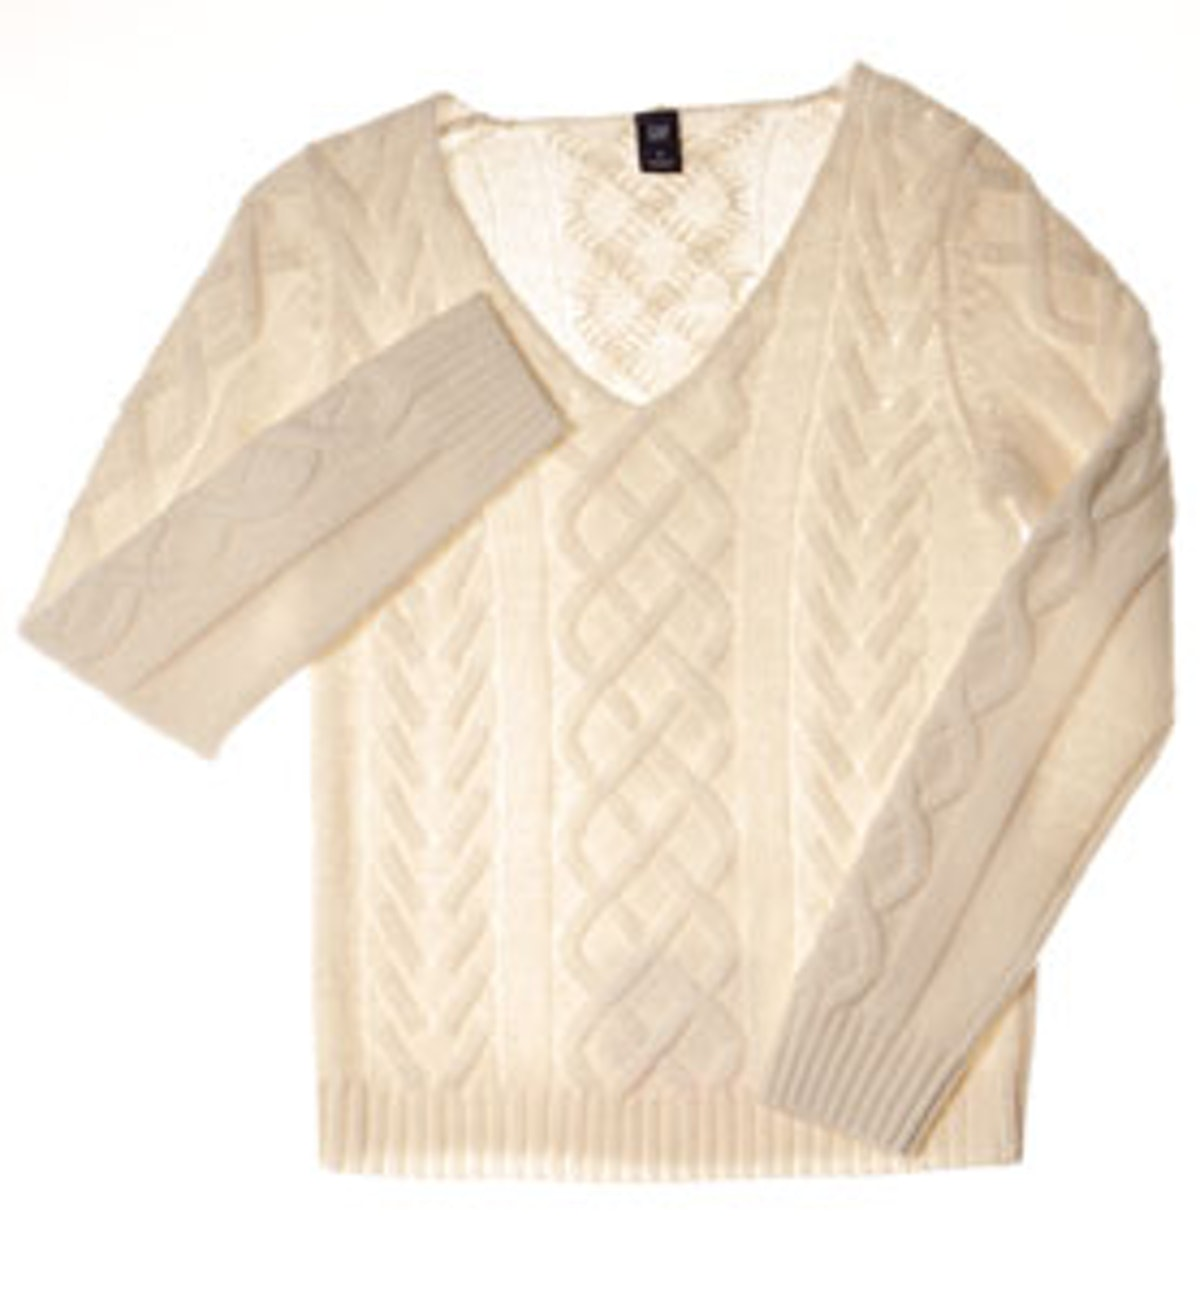 fass_sweater_03_v.jpg